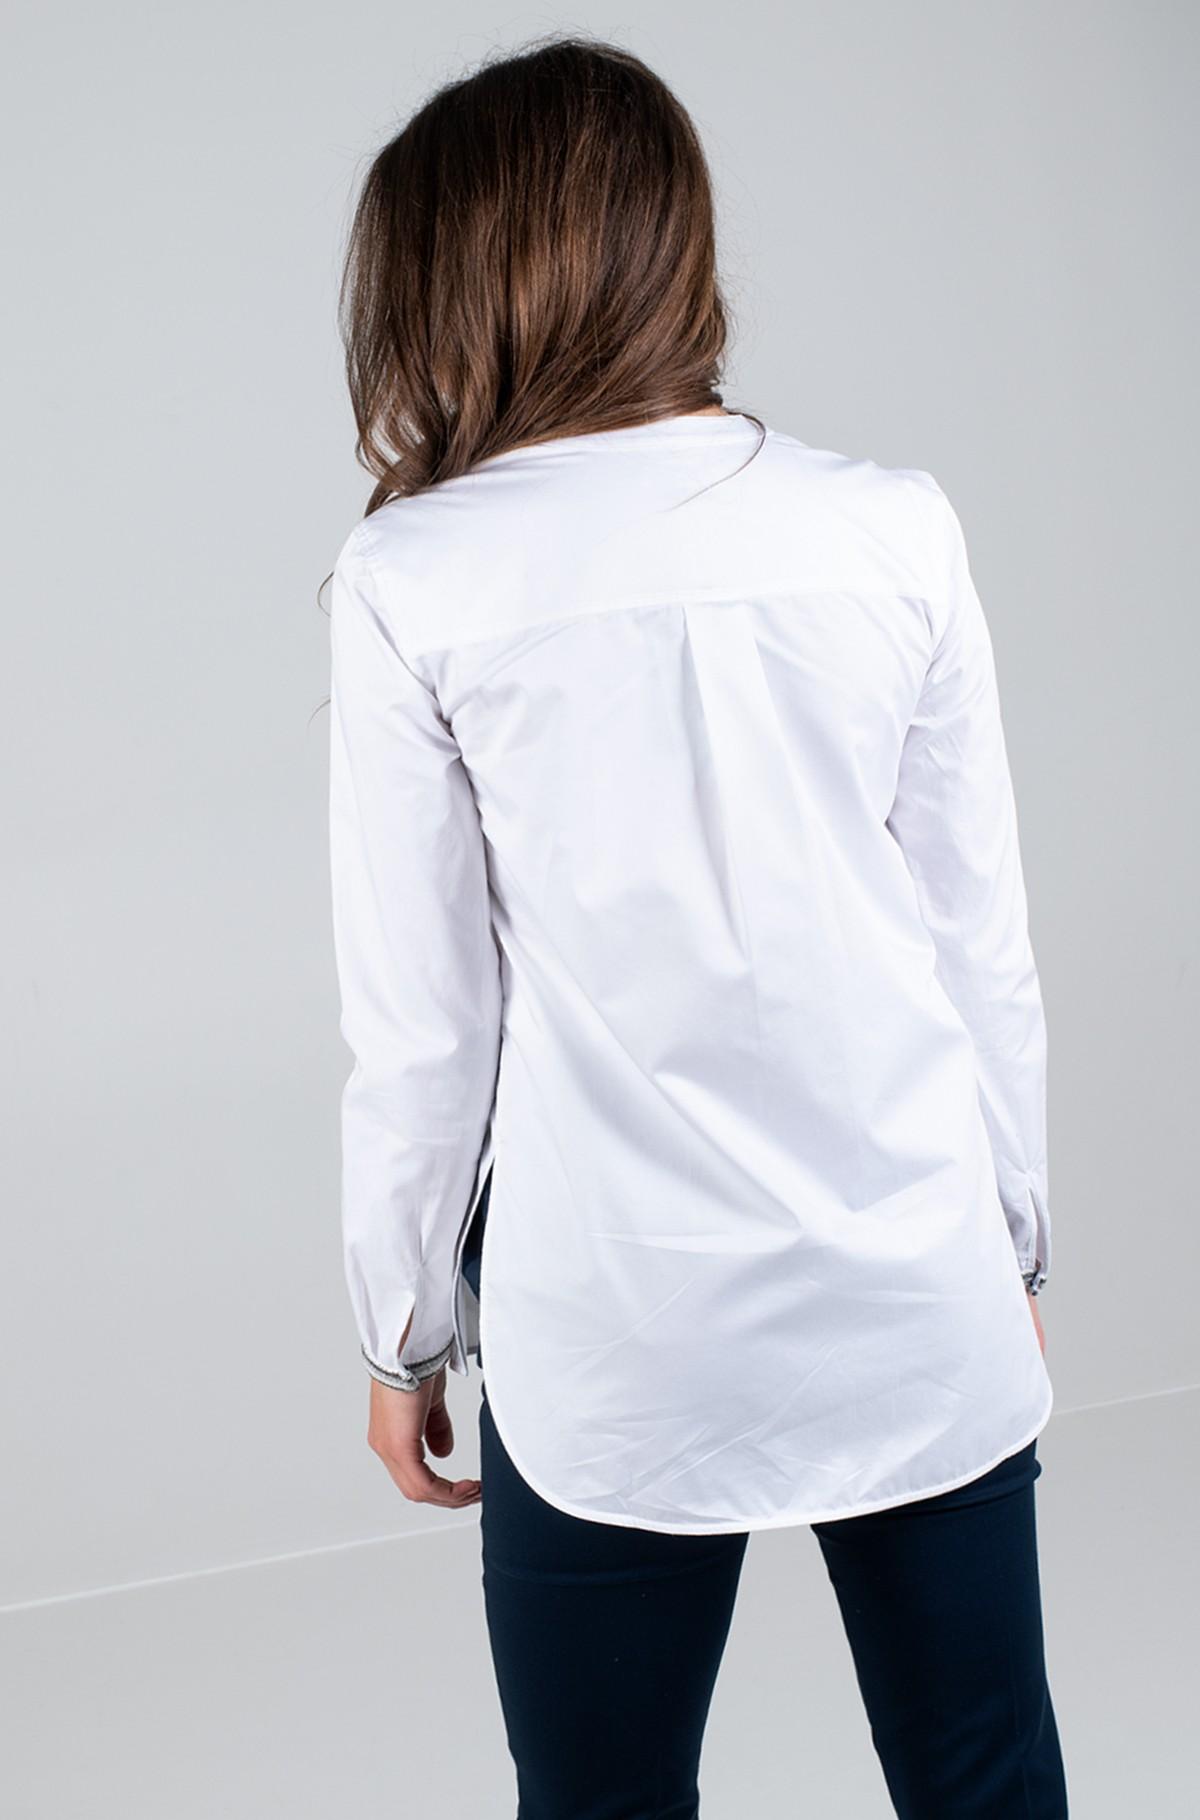 Marškiniai OC DEBBIE SHIRT LS W4-full-4